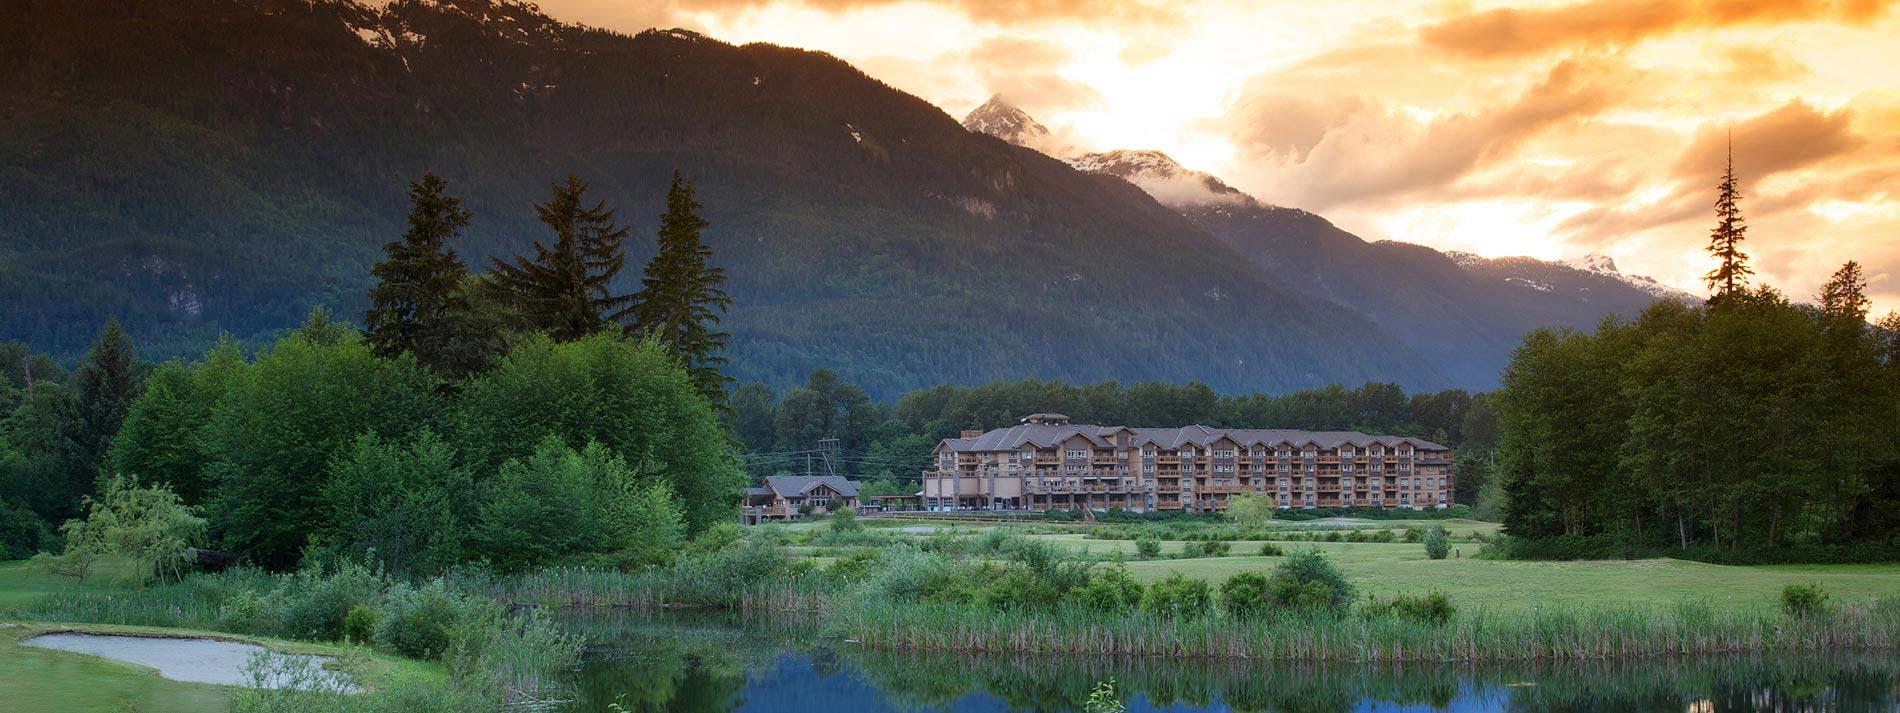 Executive Suites Hotel & Resort Squamish at dusk